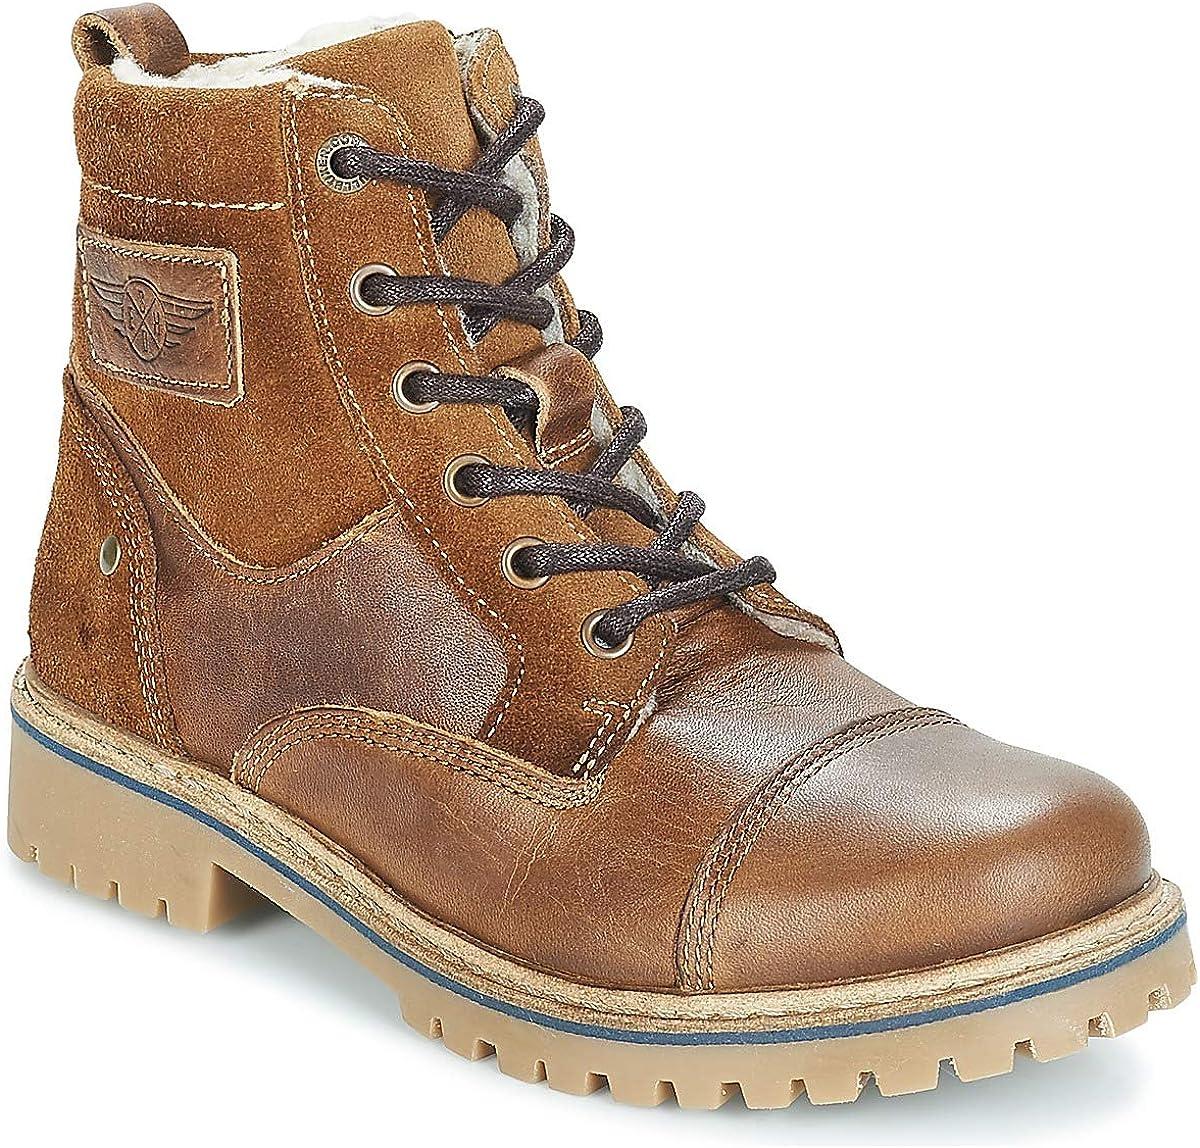 BULLBOXER Lervo Ankle Boots/Boots Boys